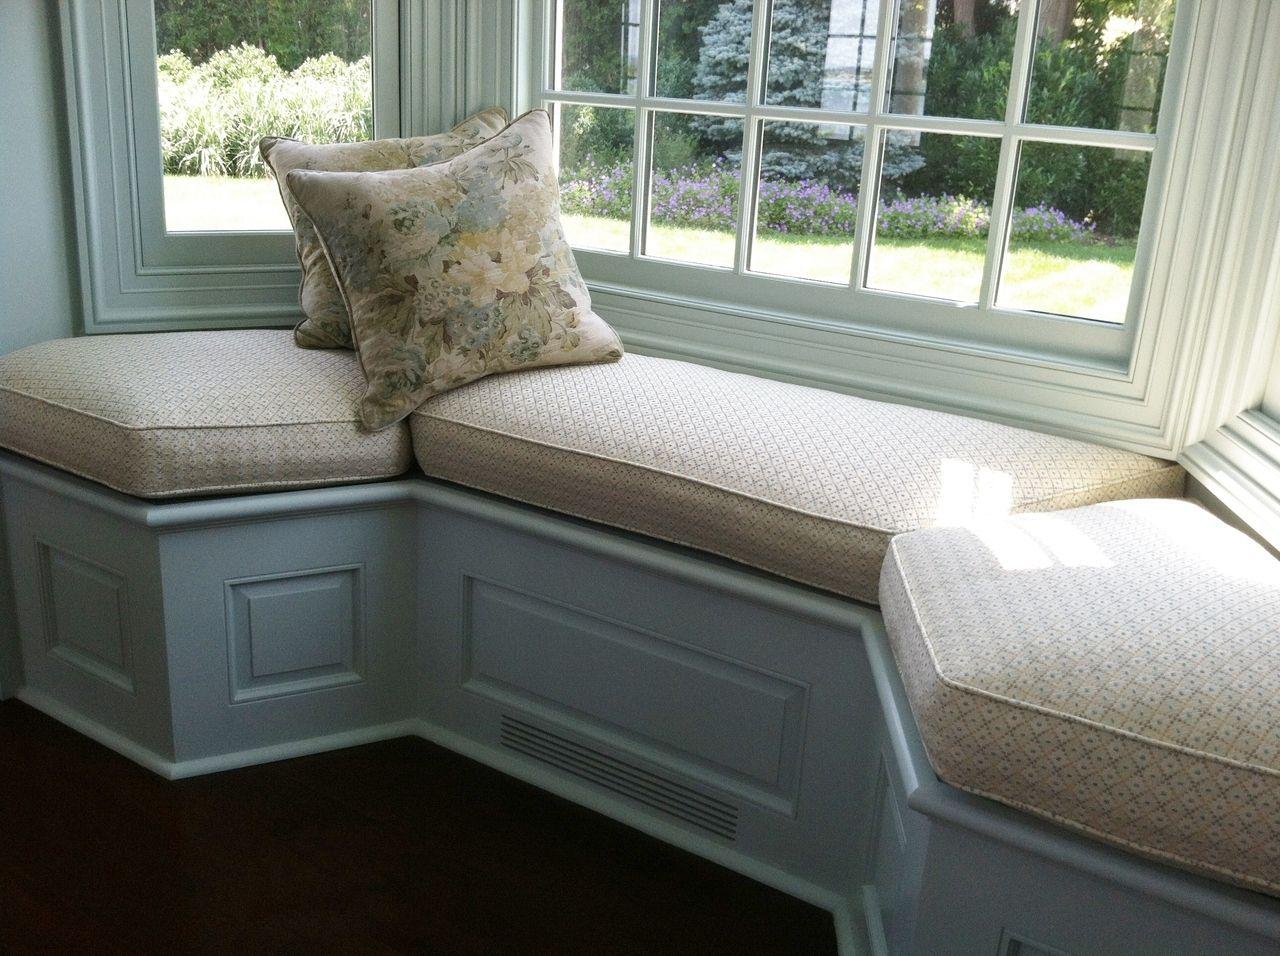 Country Window Seat Cushion Window Seat Cushions Home Decor Bedroom Window Seat Kitchen